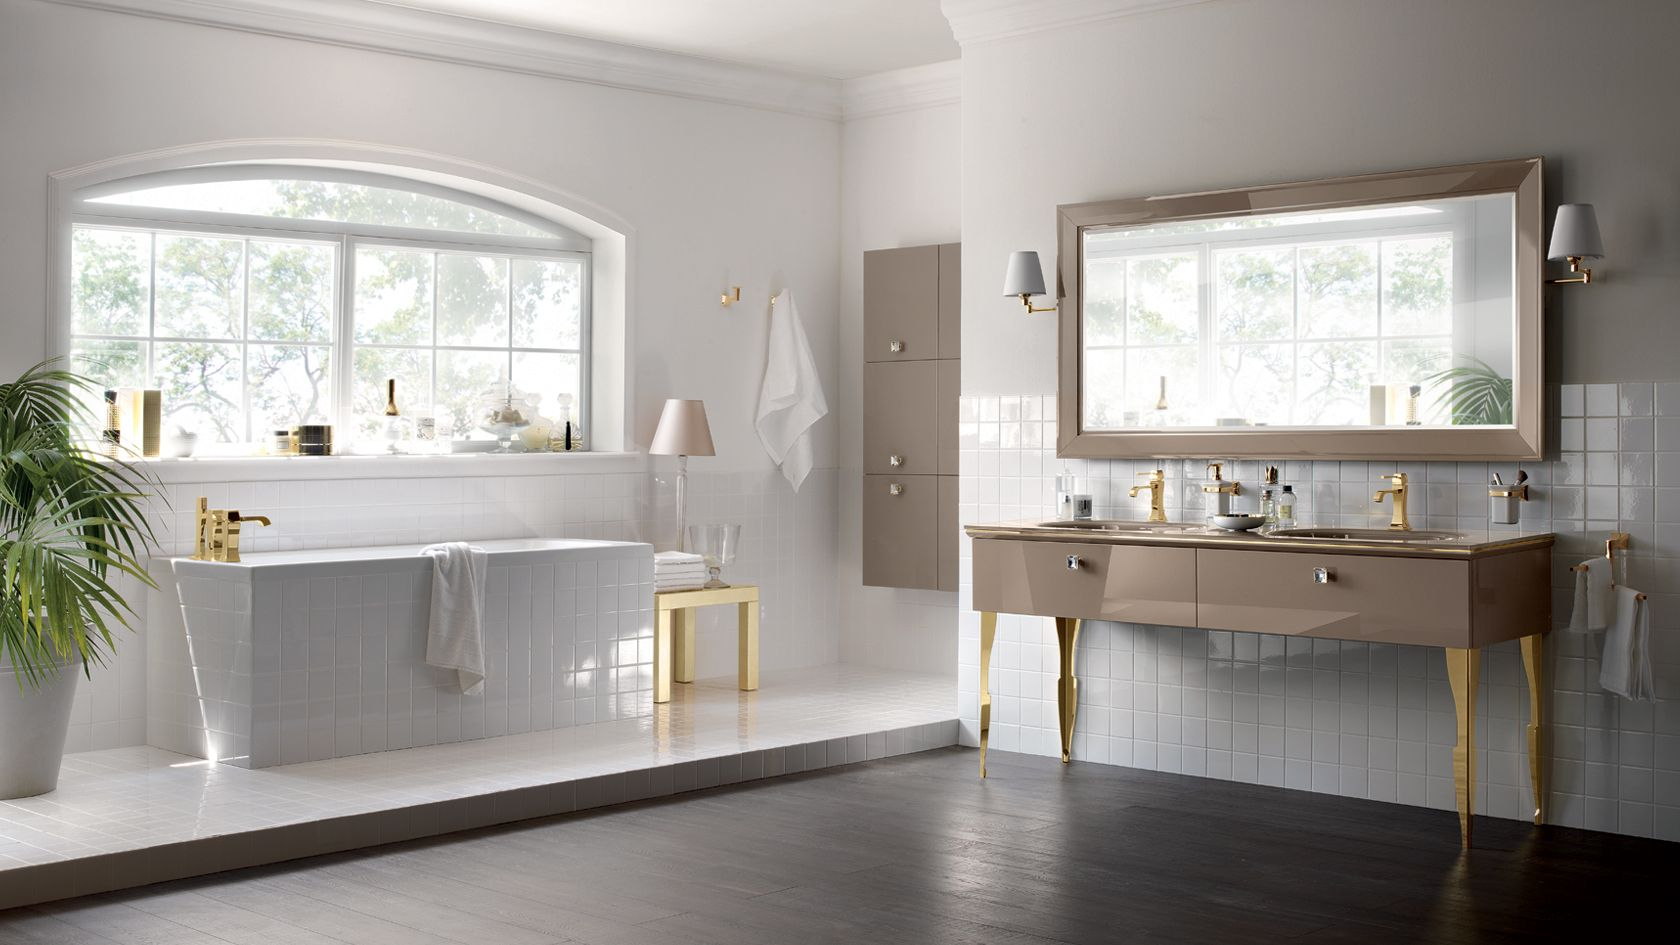 Magnifica | Denenecek Projeler | Pinterest | Bath ideas, Bathroom ...